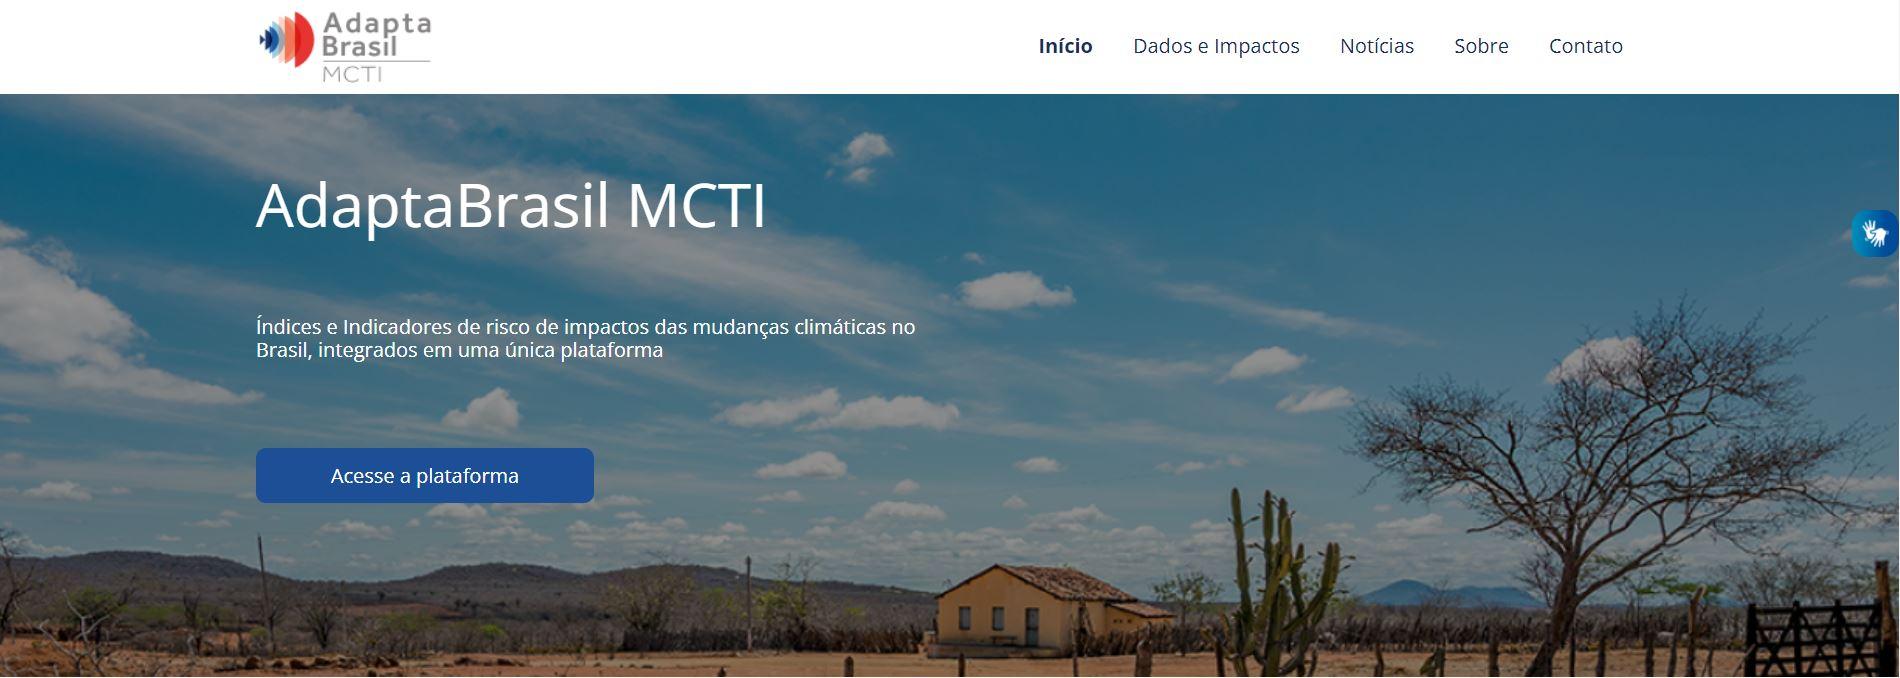 AdaptaBrasil MCTI